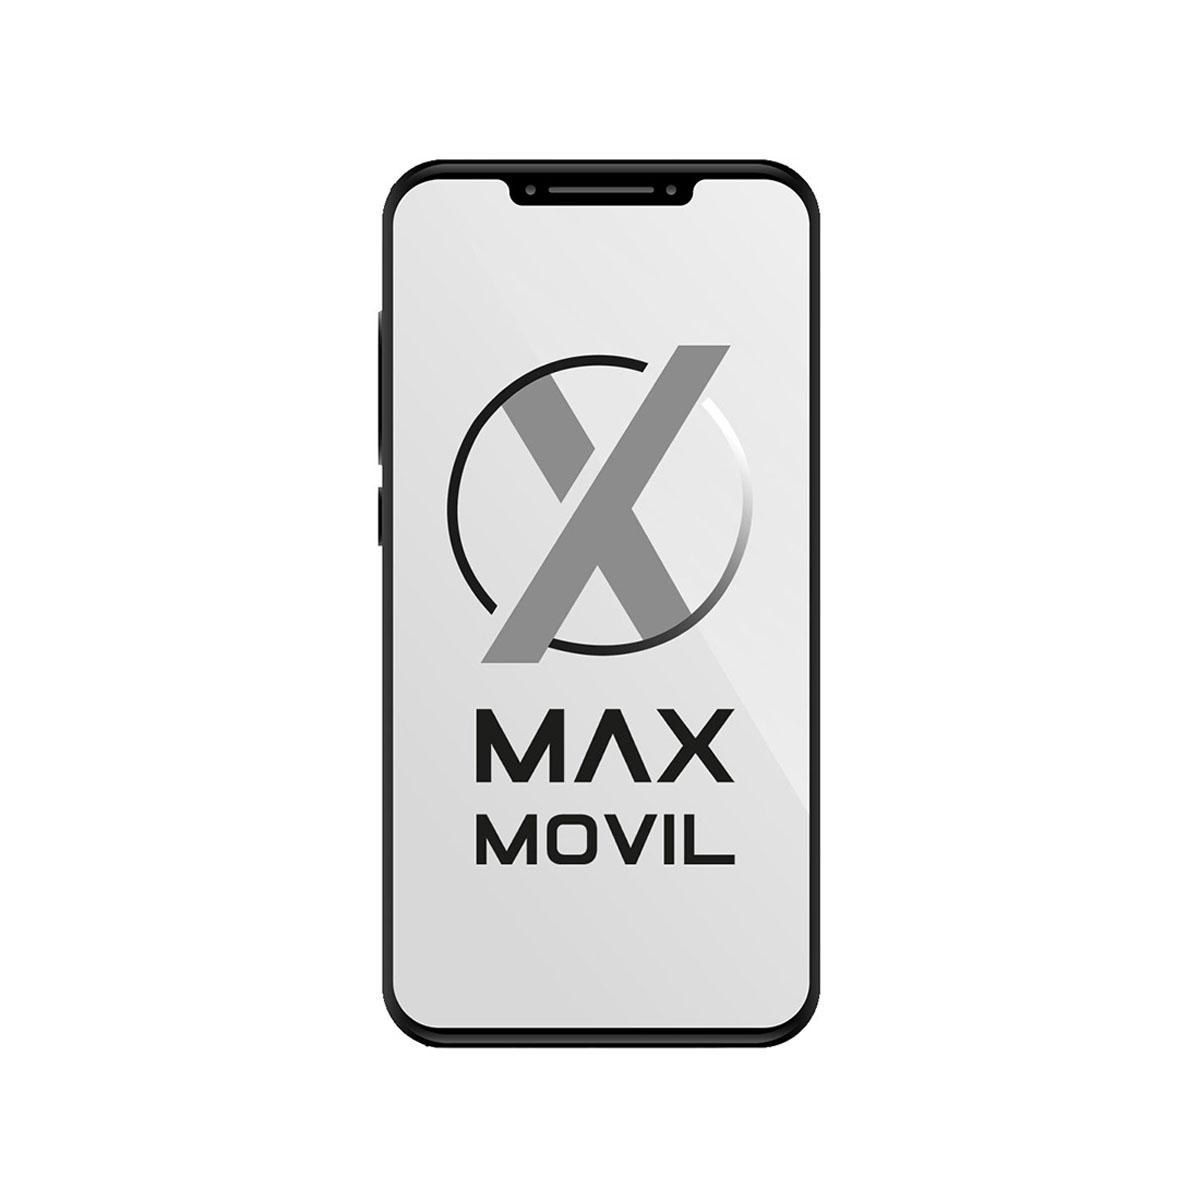 Huawei Y6 (2019) 2GB/32GB Amber Brown Dual SIM MRD-LX1